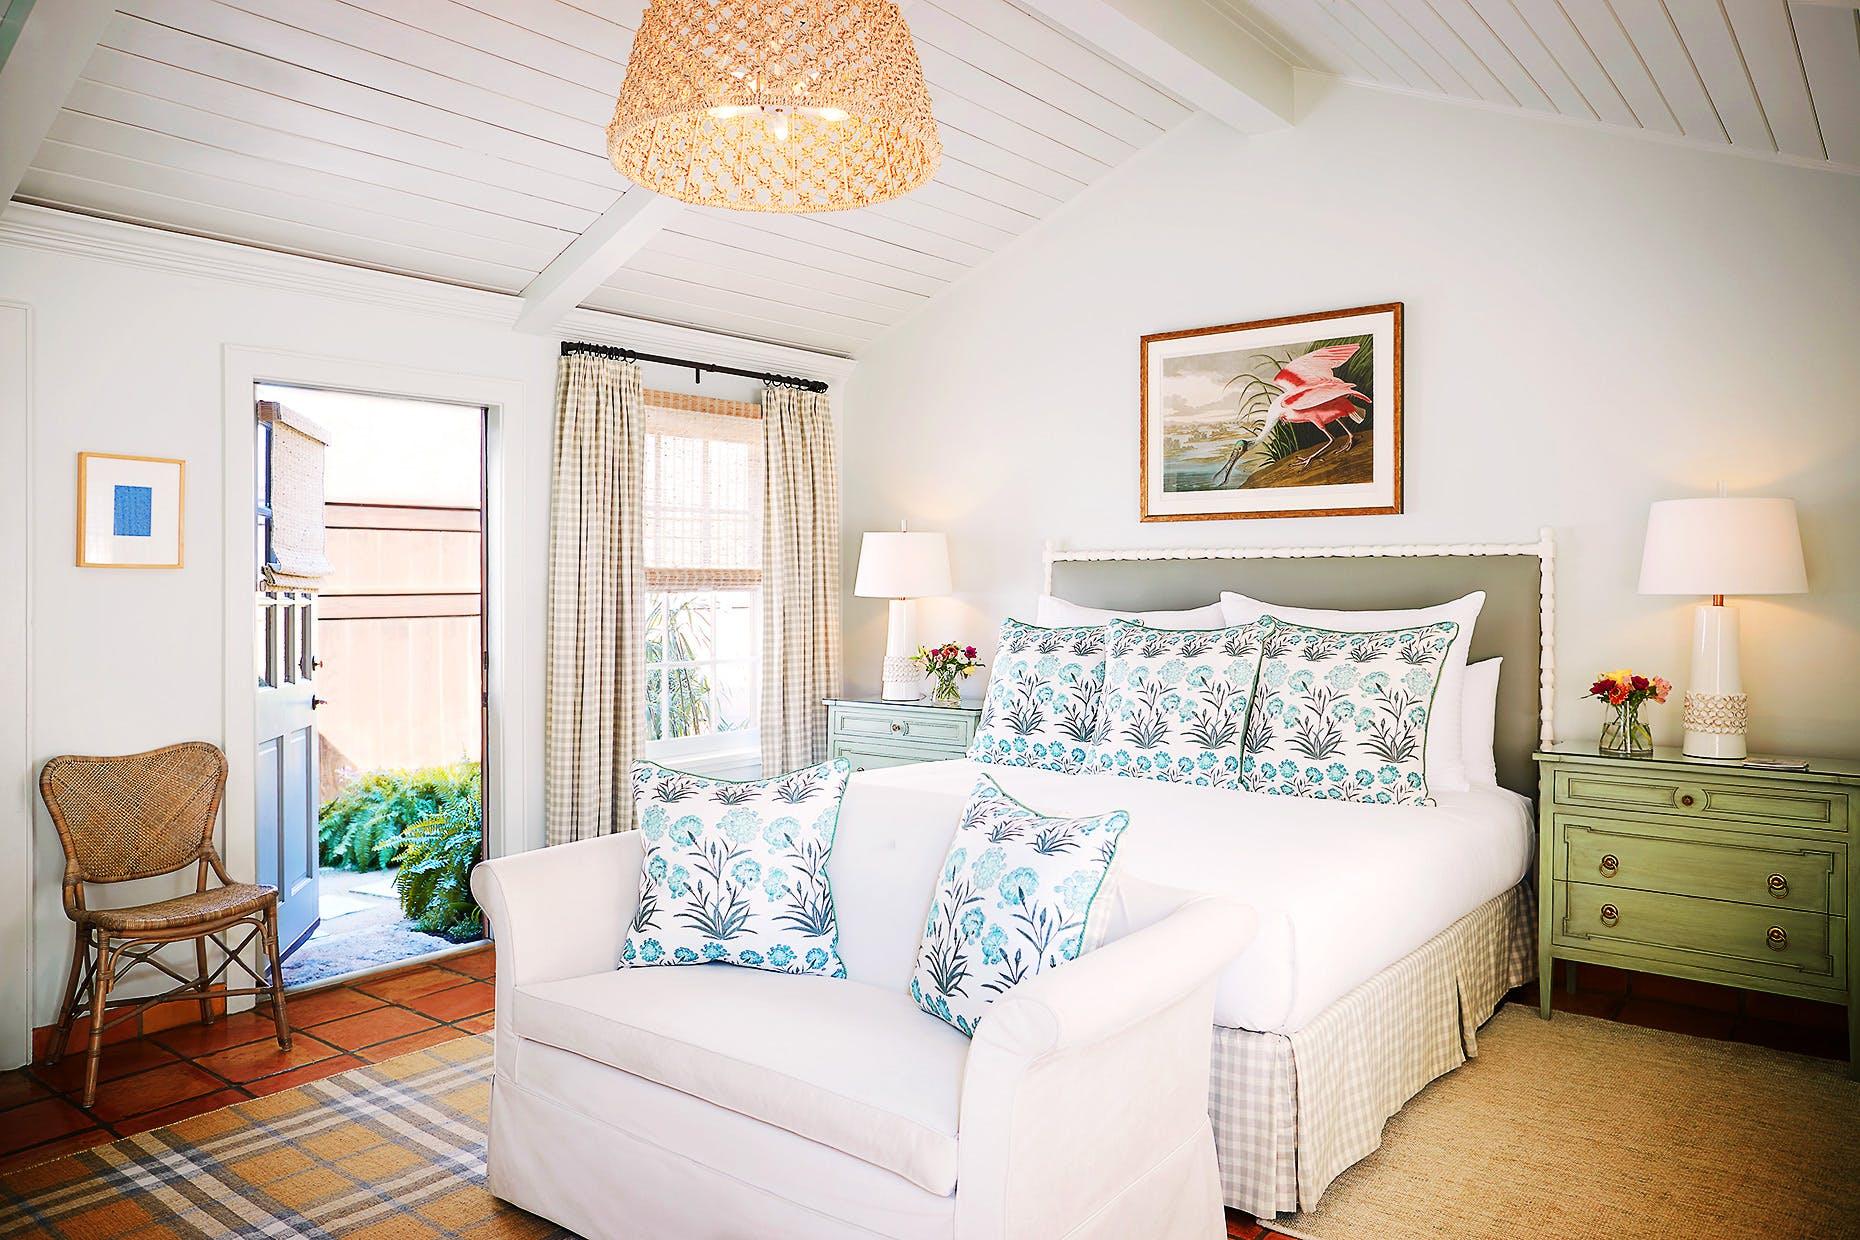 texas-staycation-lake-austin-room